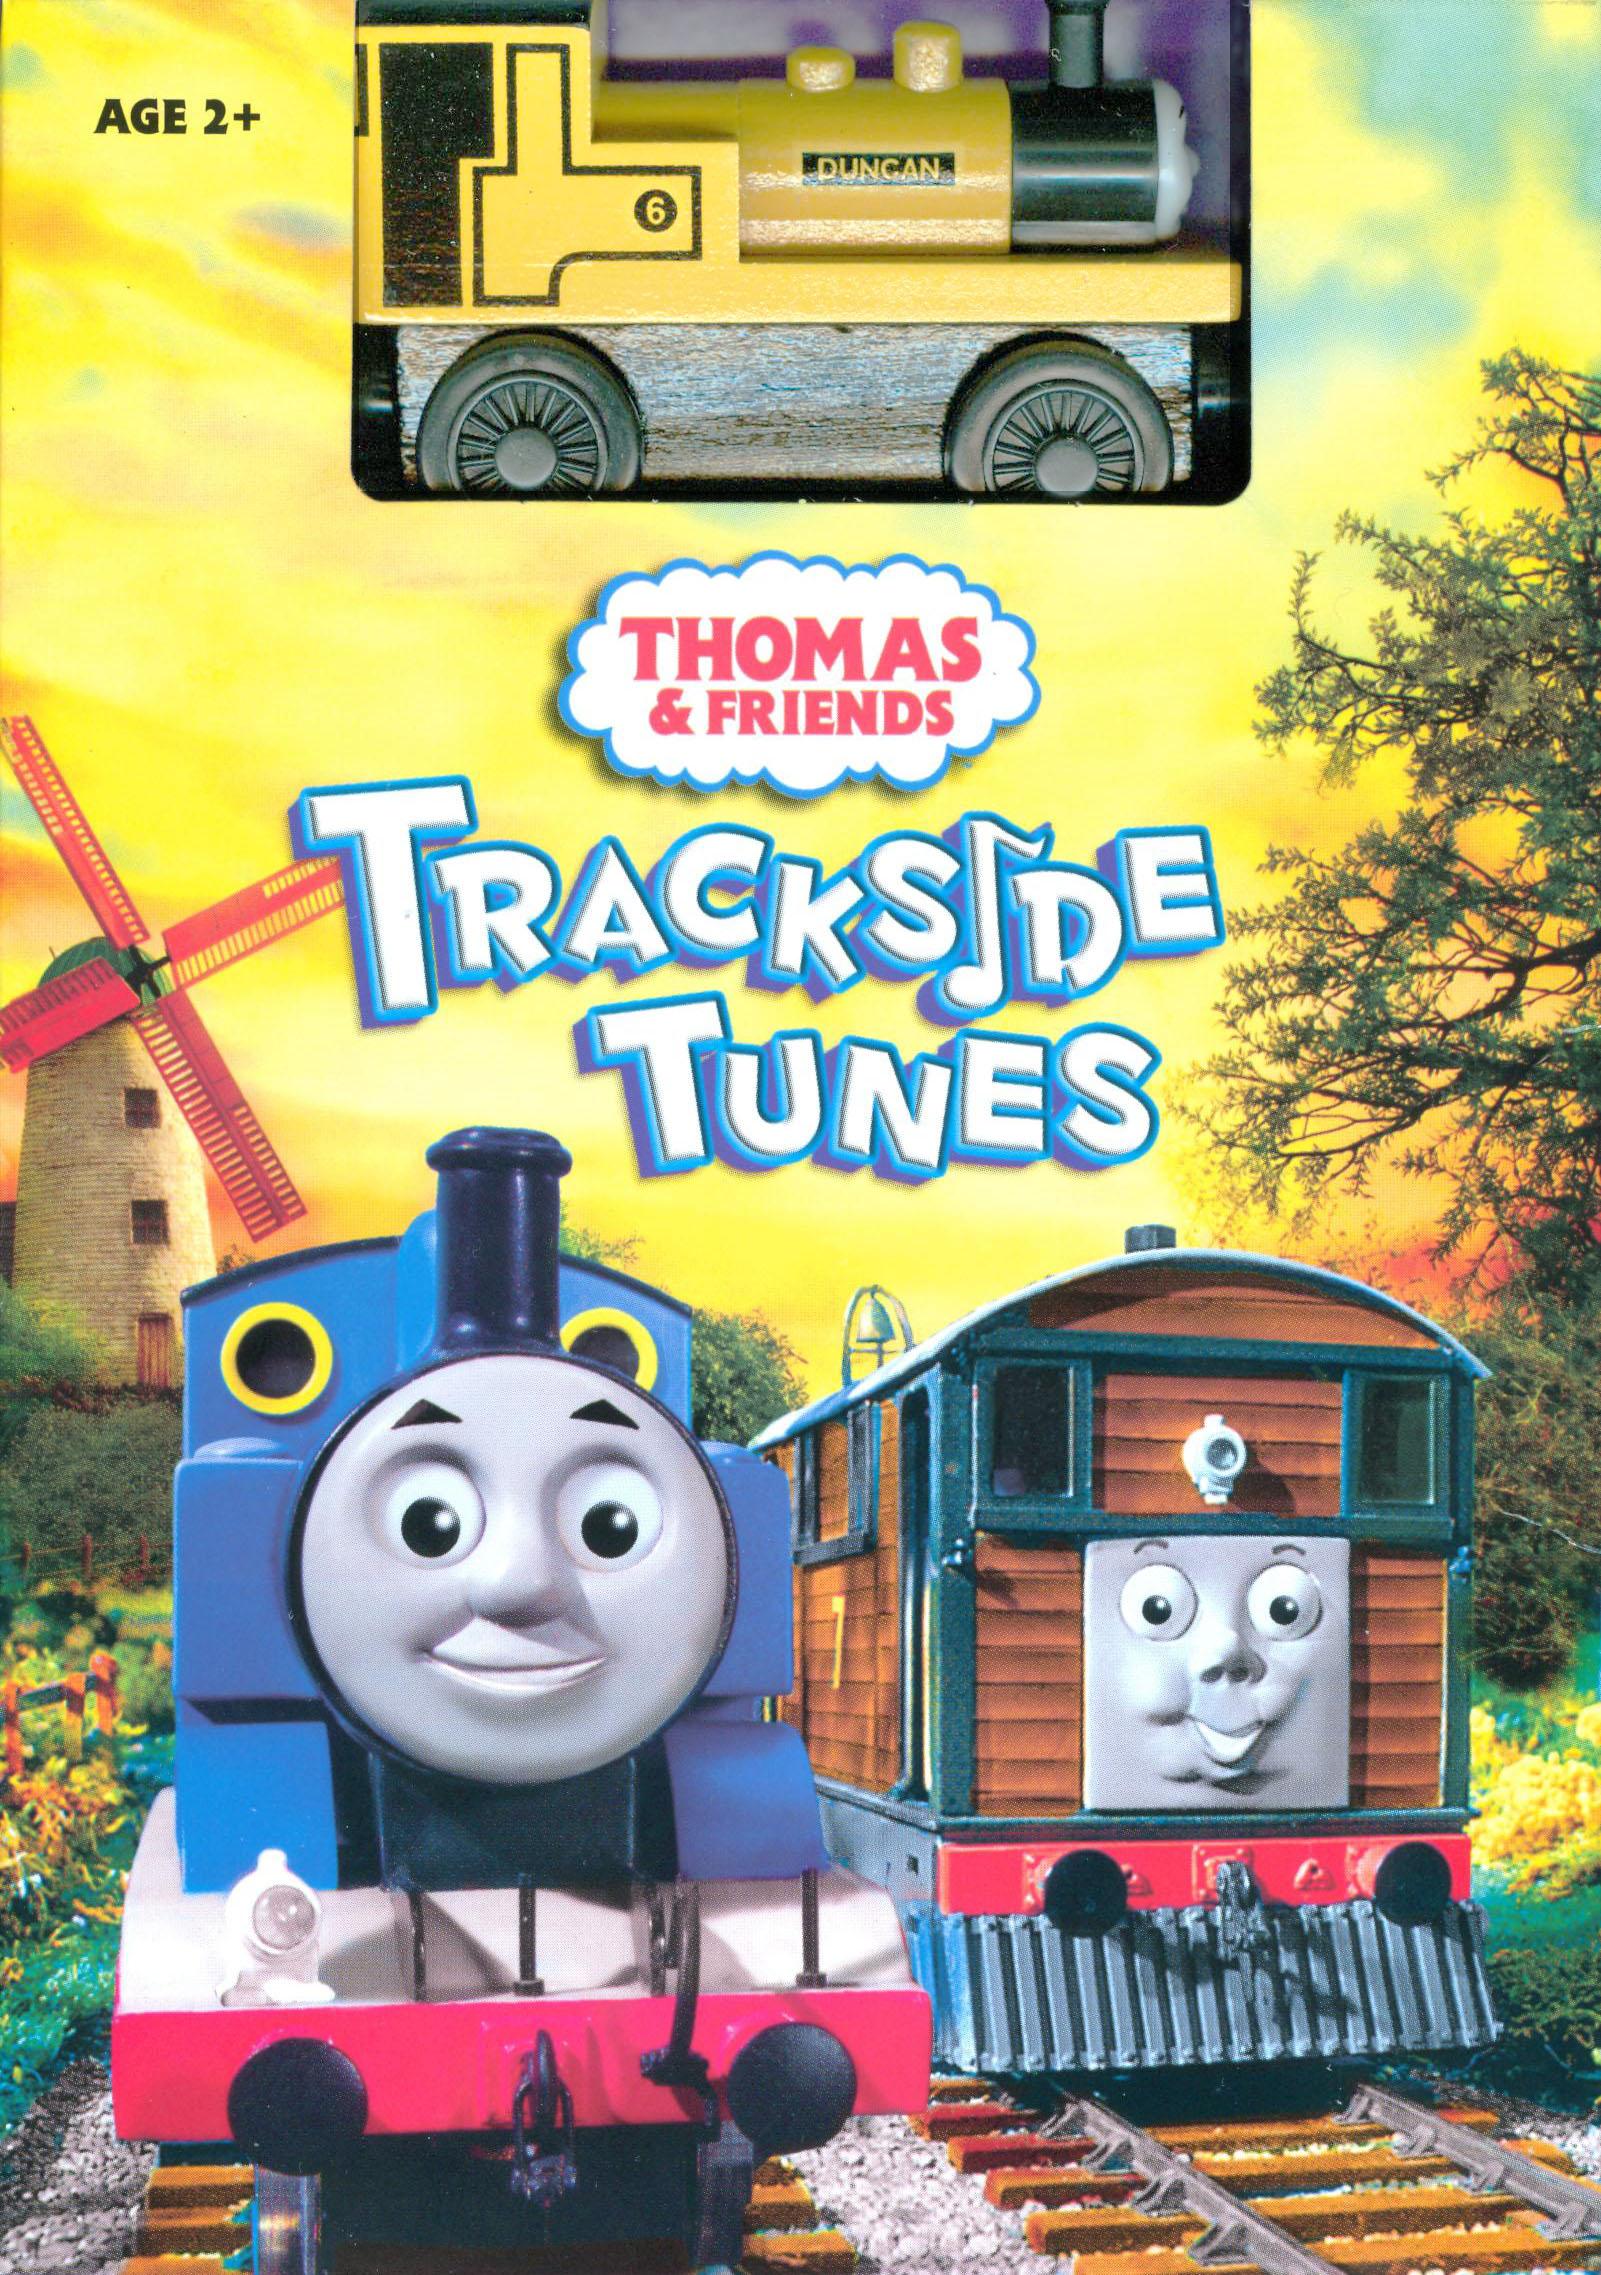 TracksideTunesDVDwithDuncan